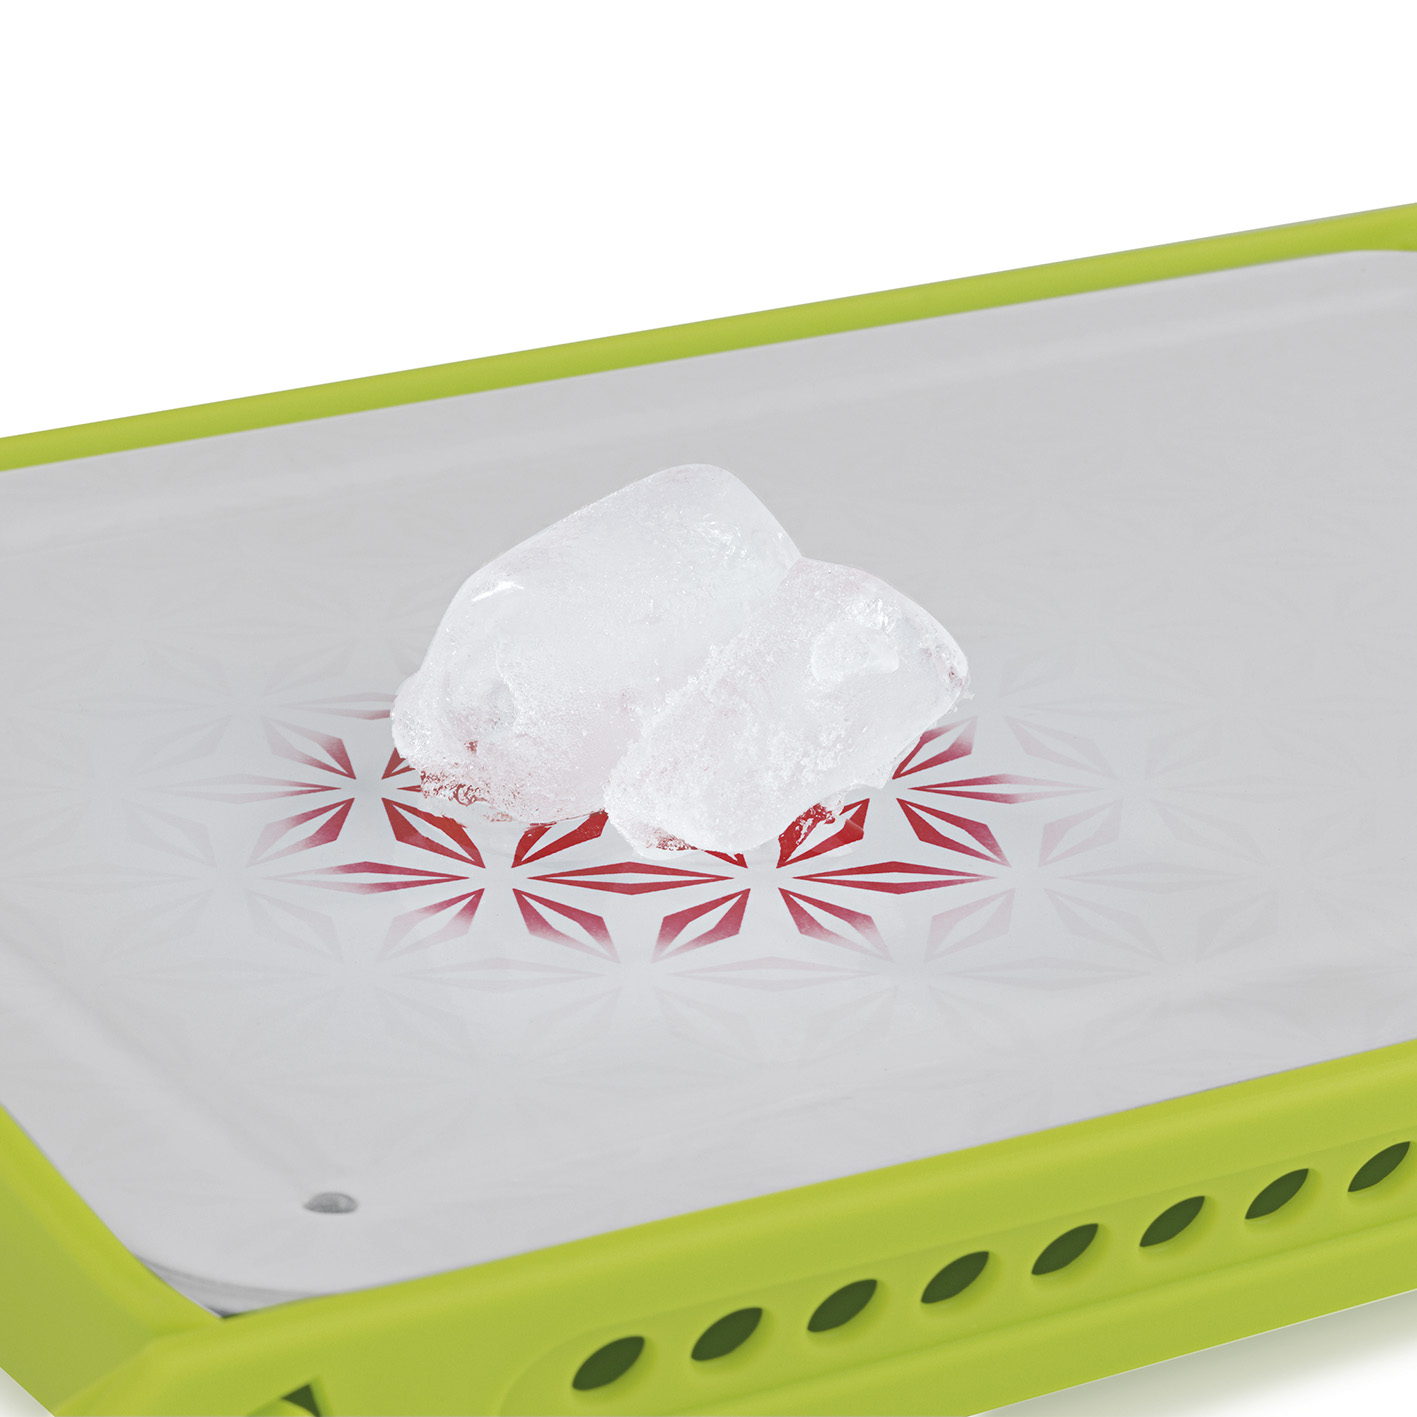 Auftauen Auftau-Tablett Schneidbrett Multifunktional Obstkorb